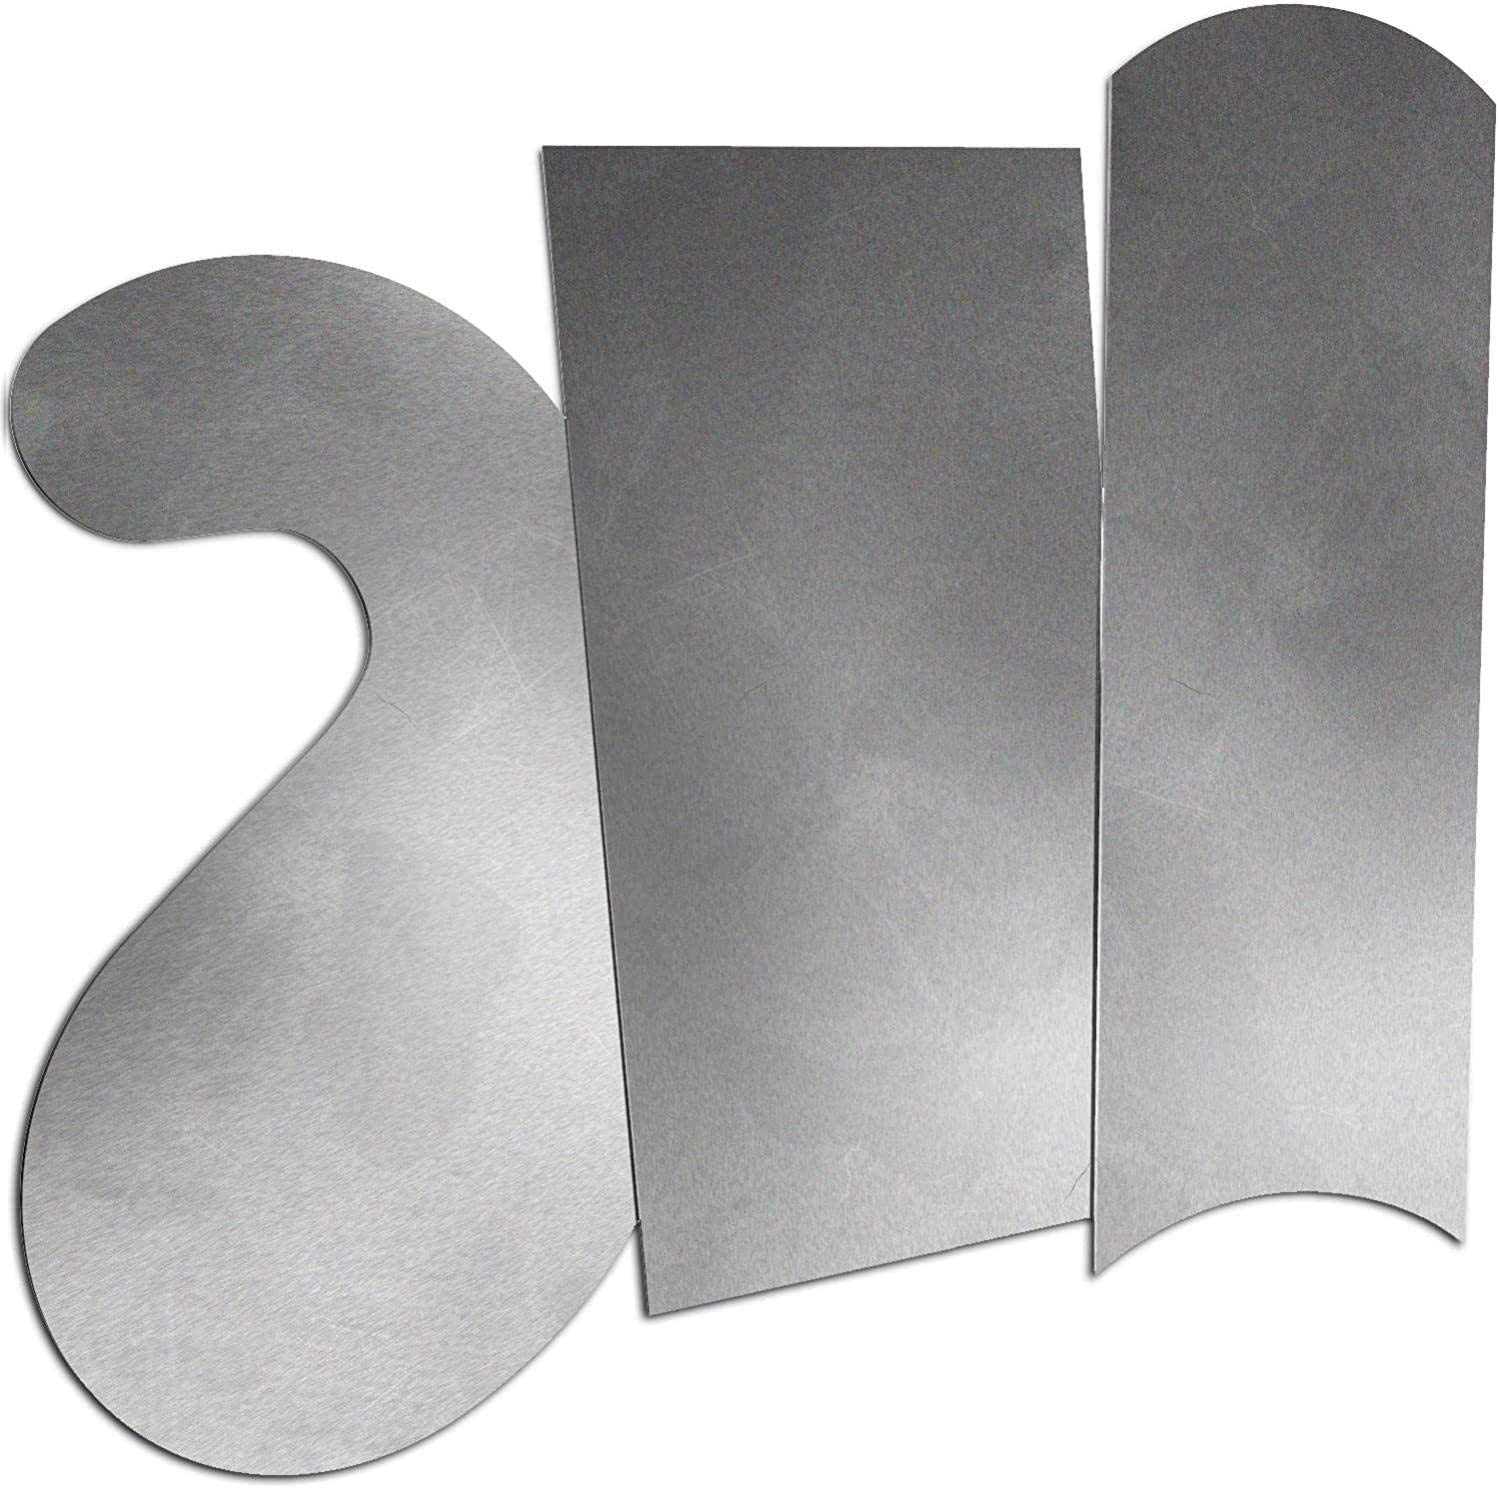 ATLIN Card Scraper Set – 3pc Cabinet Scraper Set